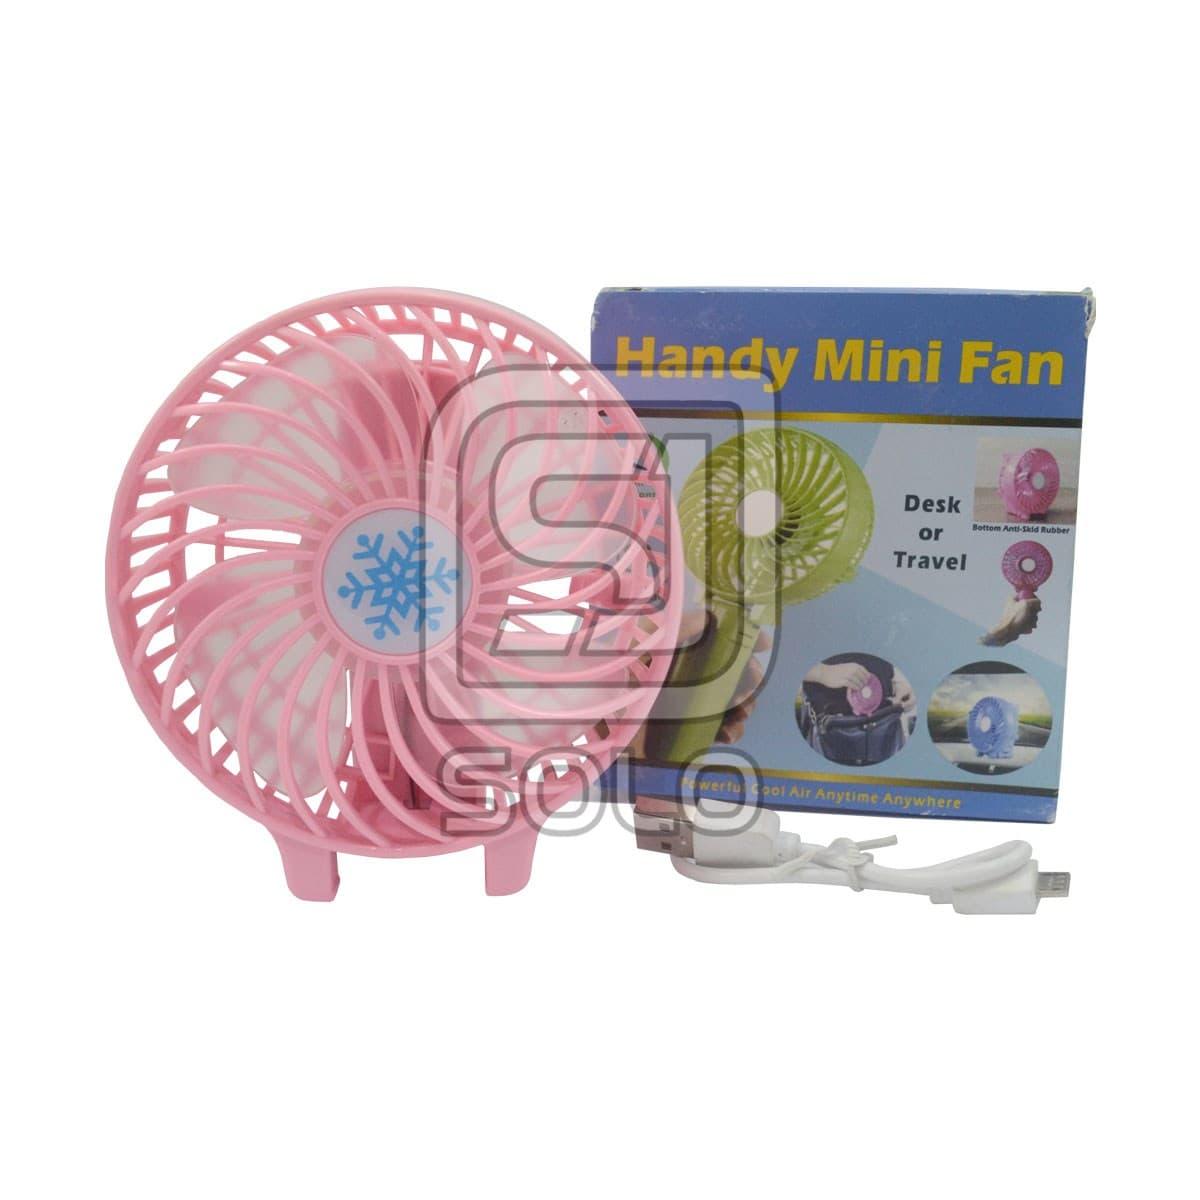 Kipas Angin Handy Mini Fan Flexible Usb Kipas Tangan Portable